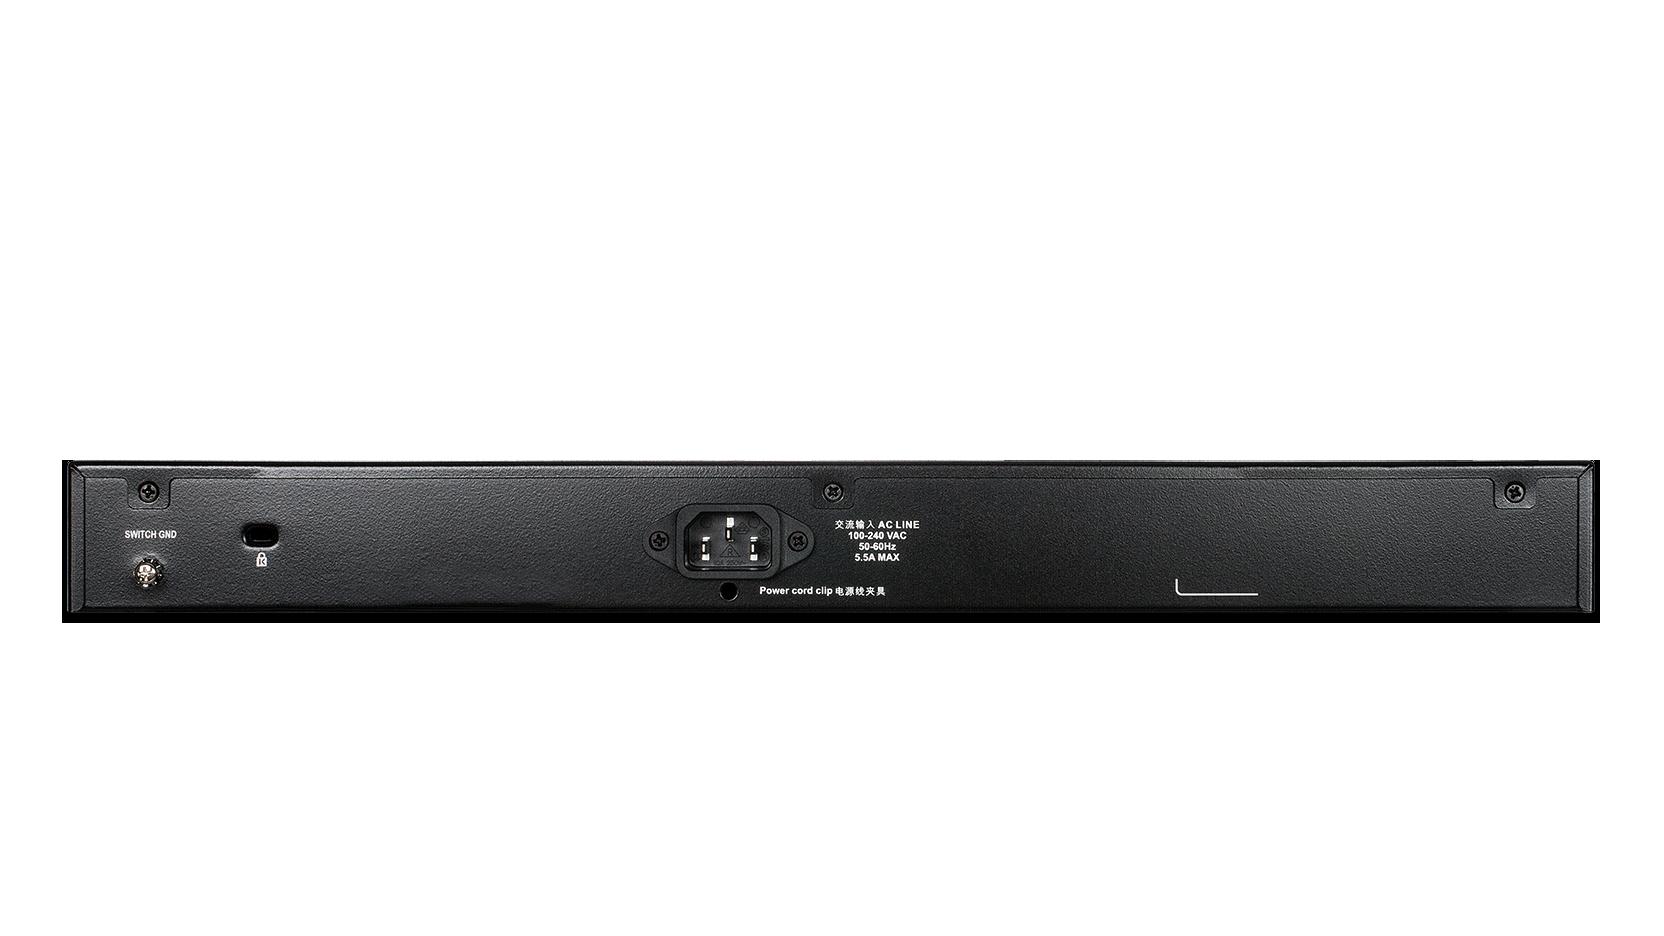 DGS-1510-28XMP-Back-1664×936